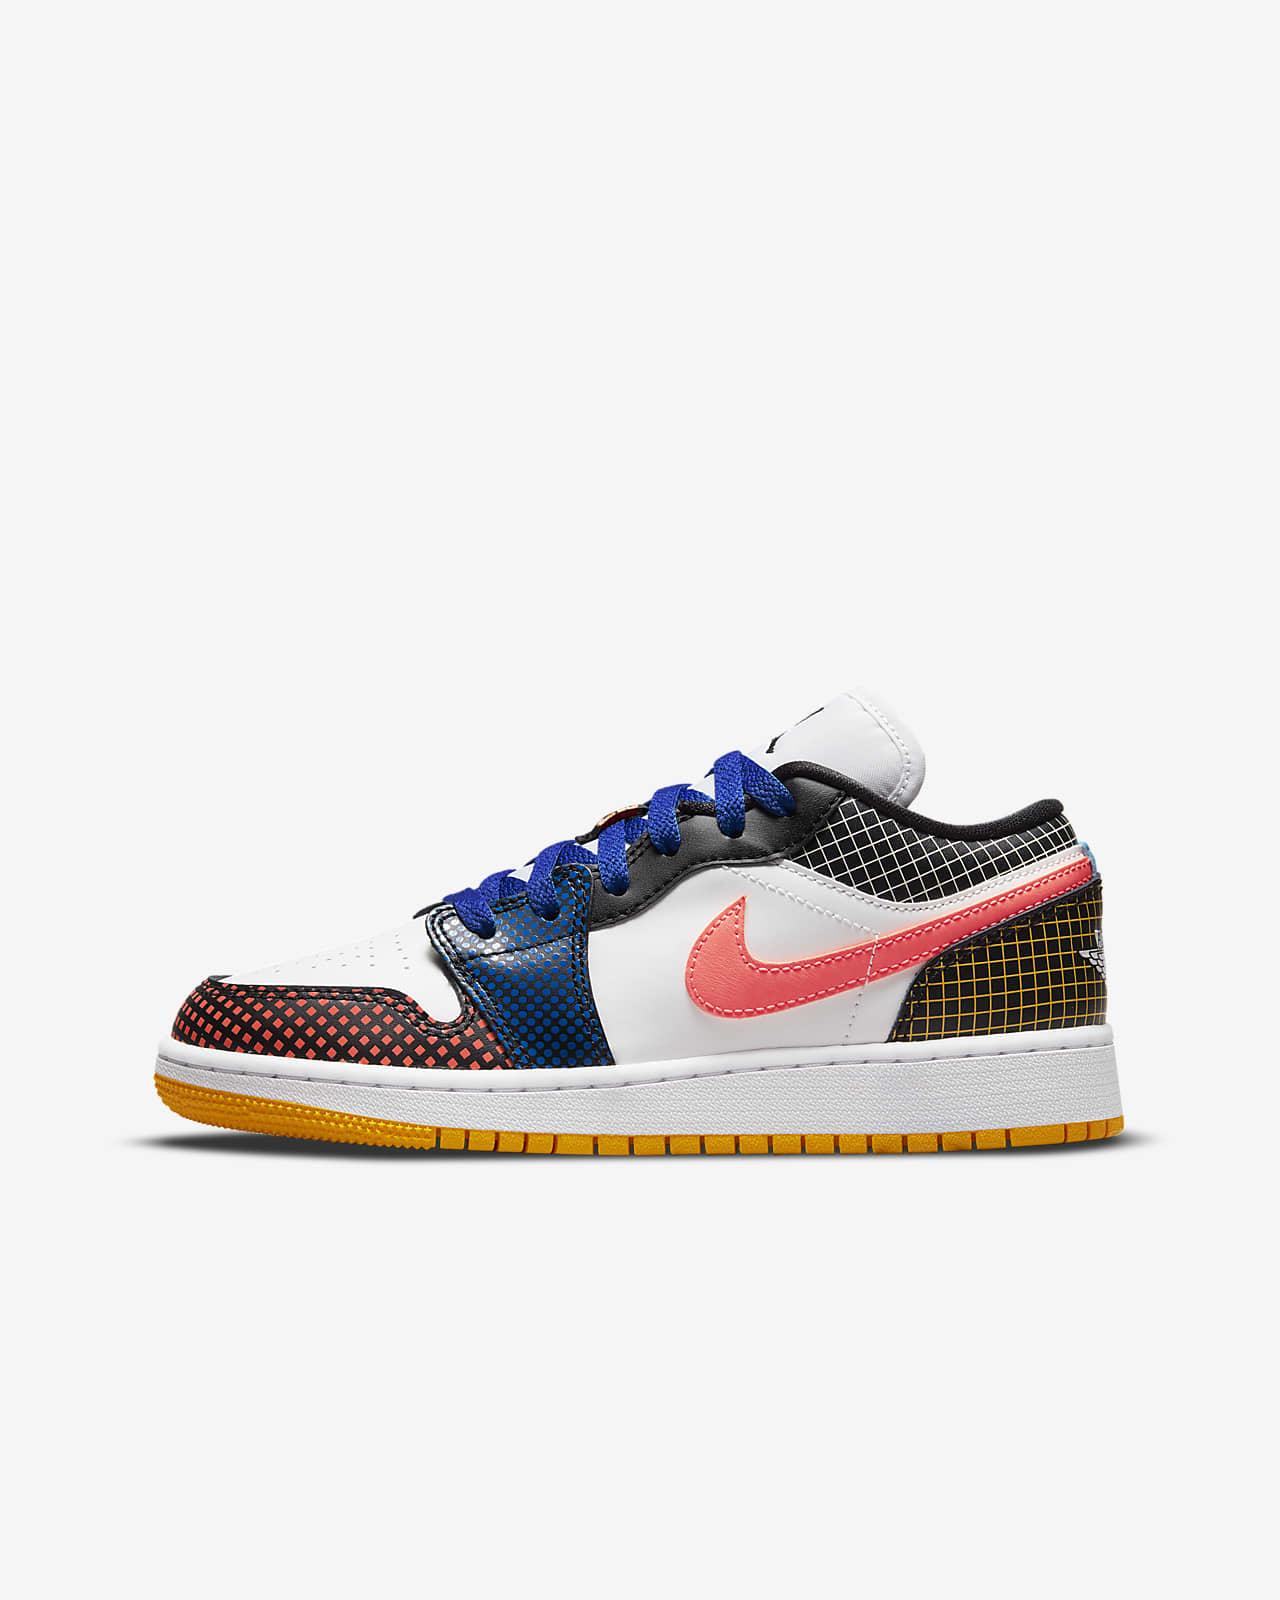 Air Jordan 1 Low MMD BG 大童运动童鞋